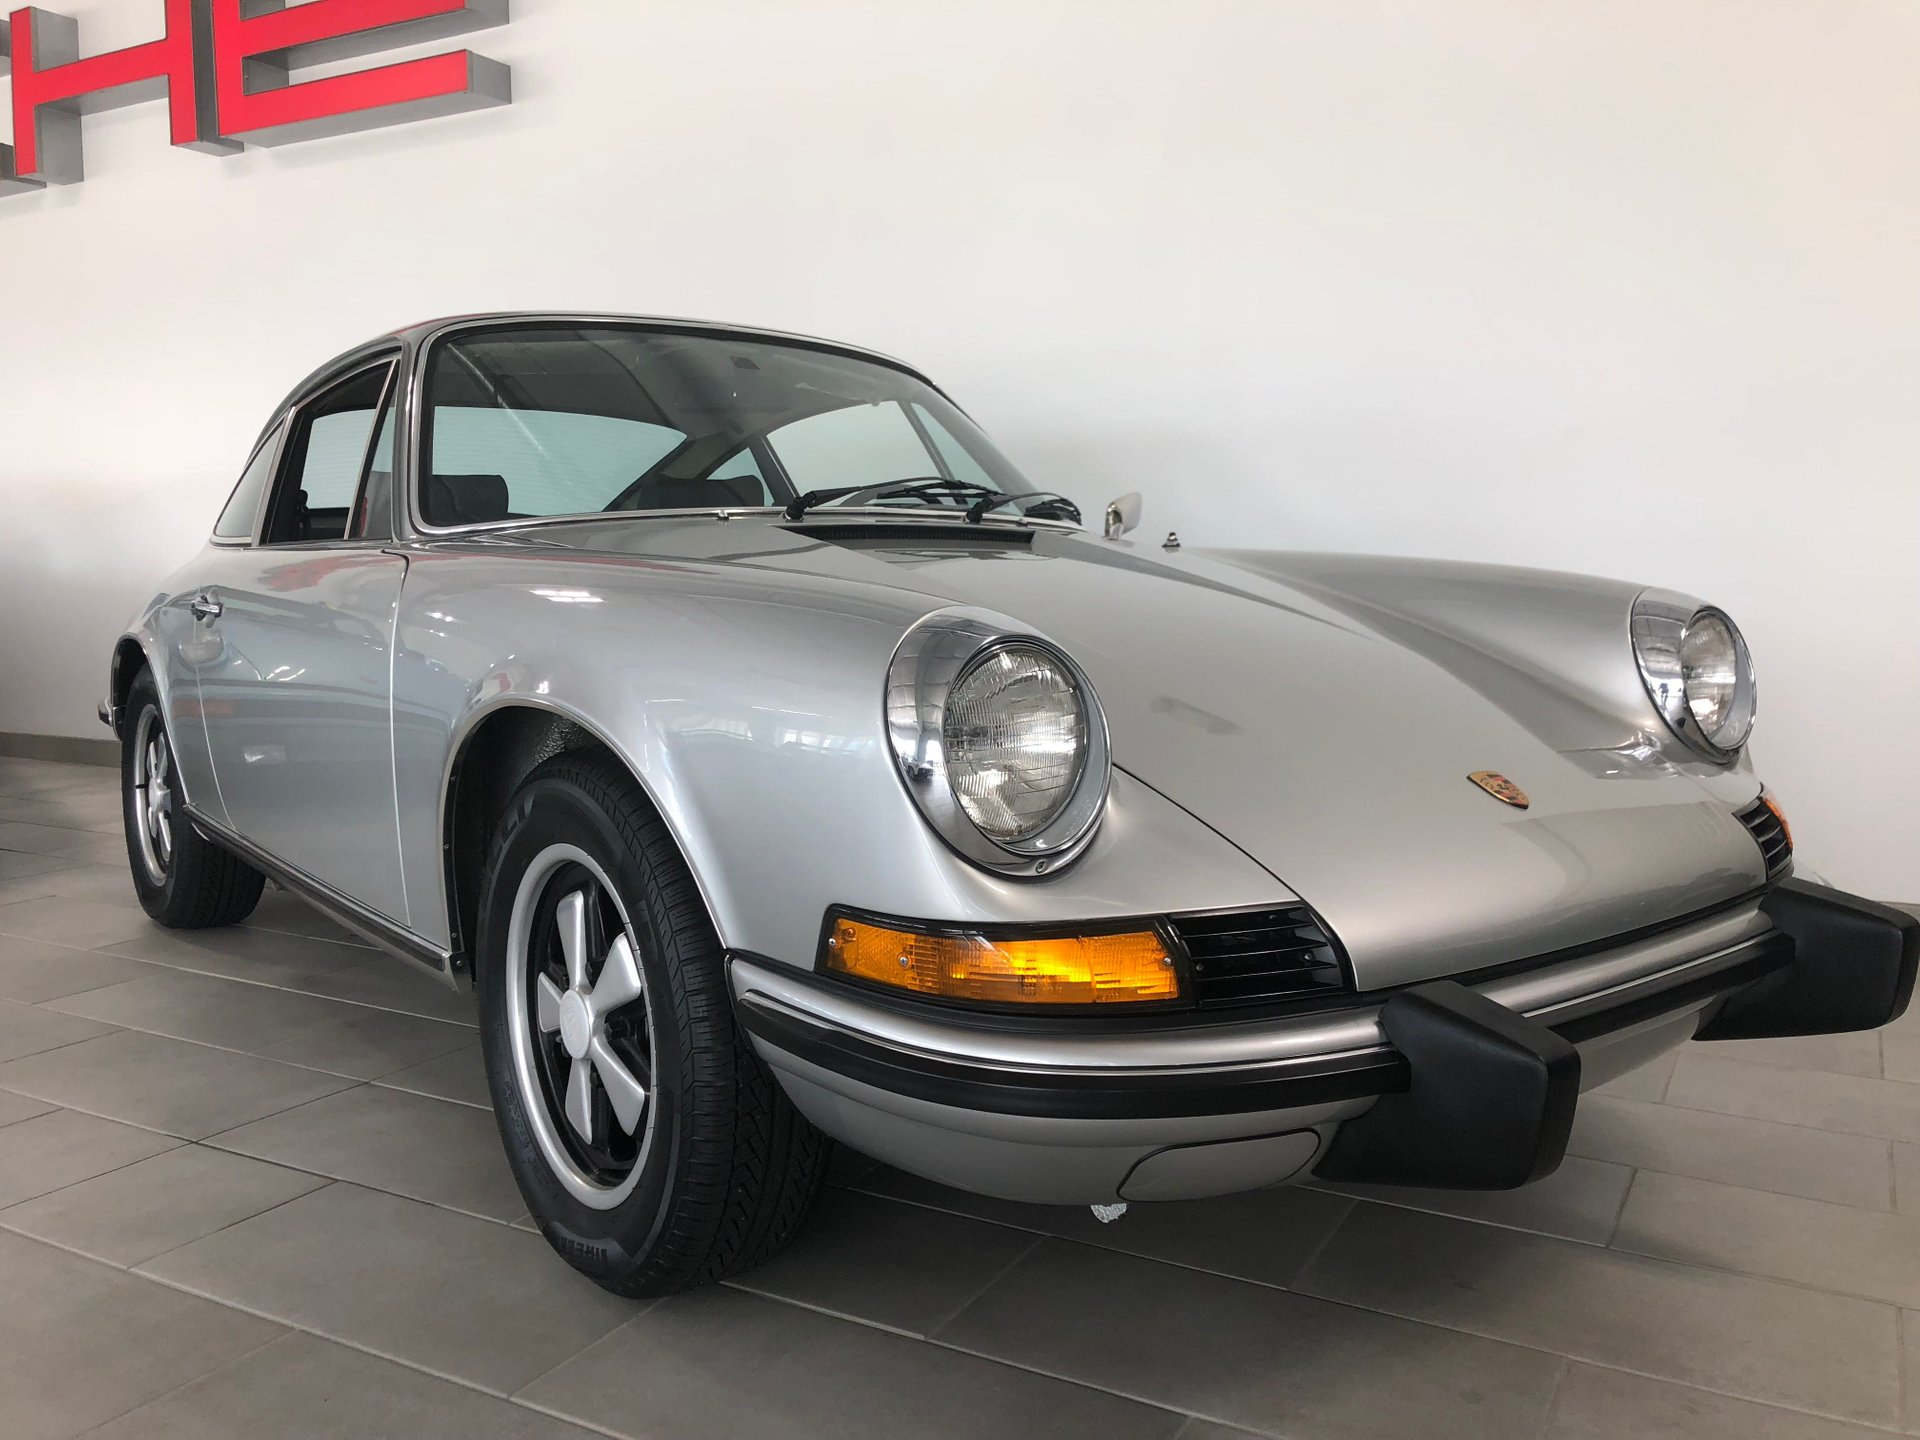 1973 porsche 911t all original 19k miles